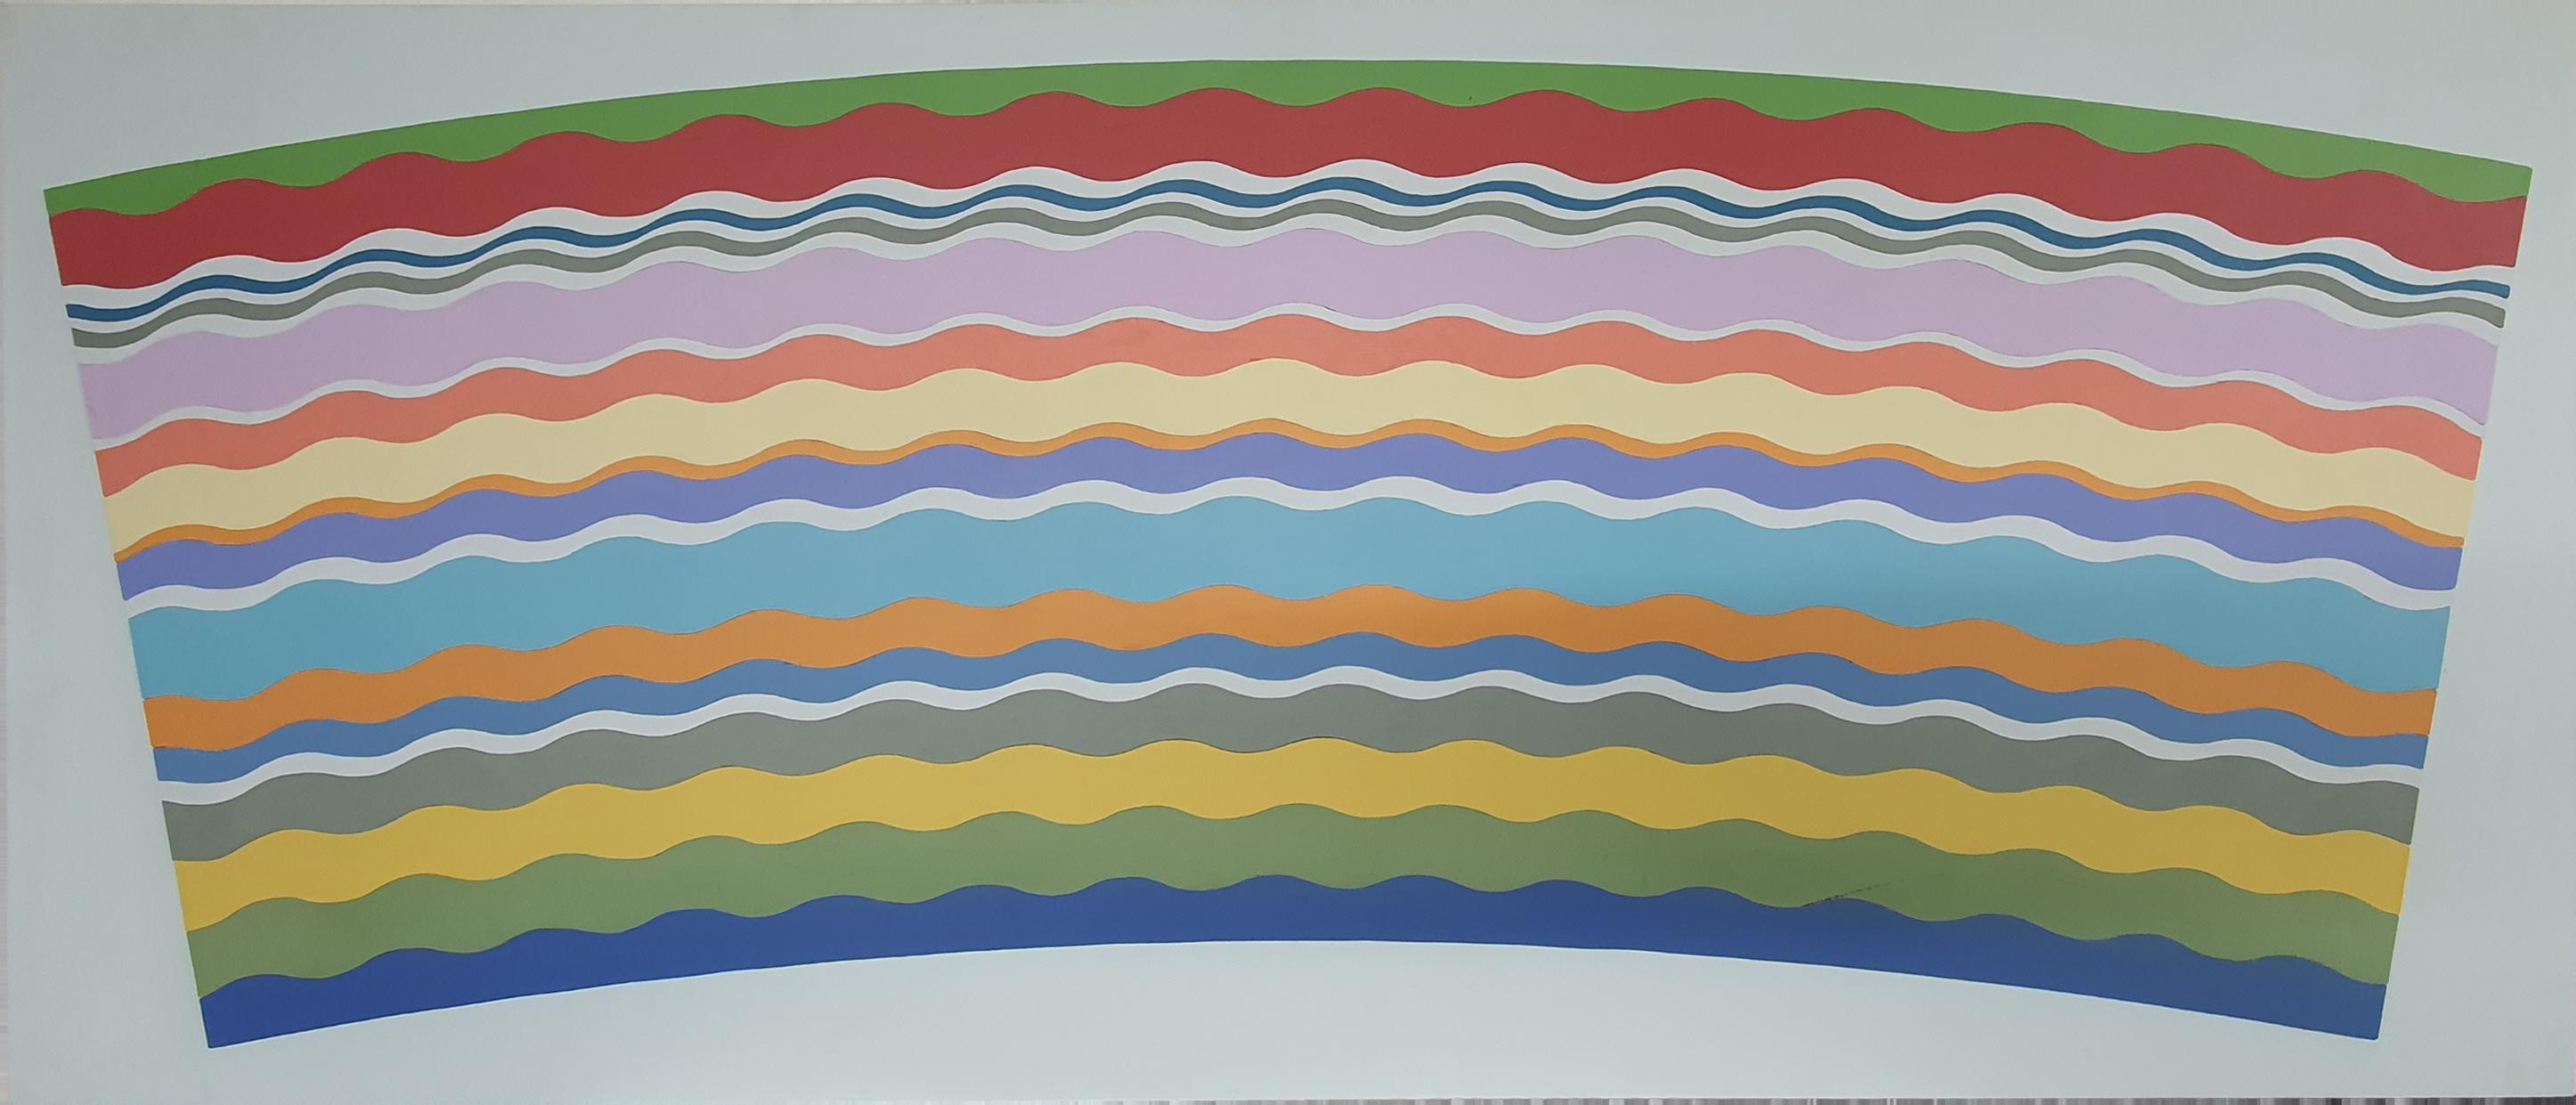 Brian Weavers Wavy Rainbow